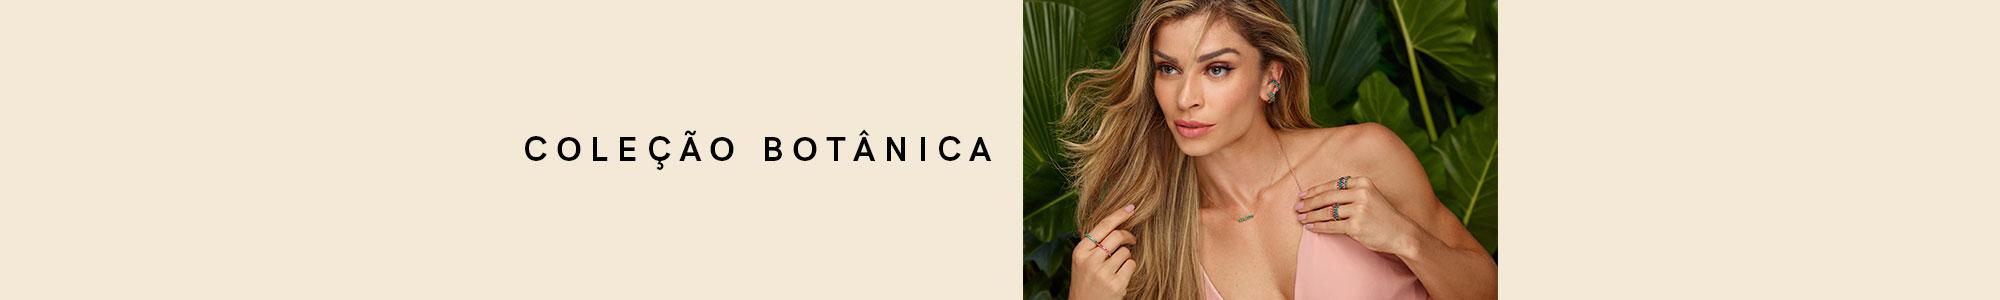 banner-botanica